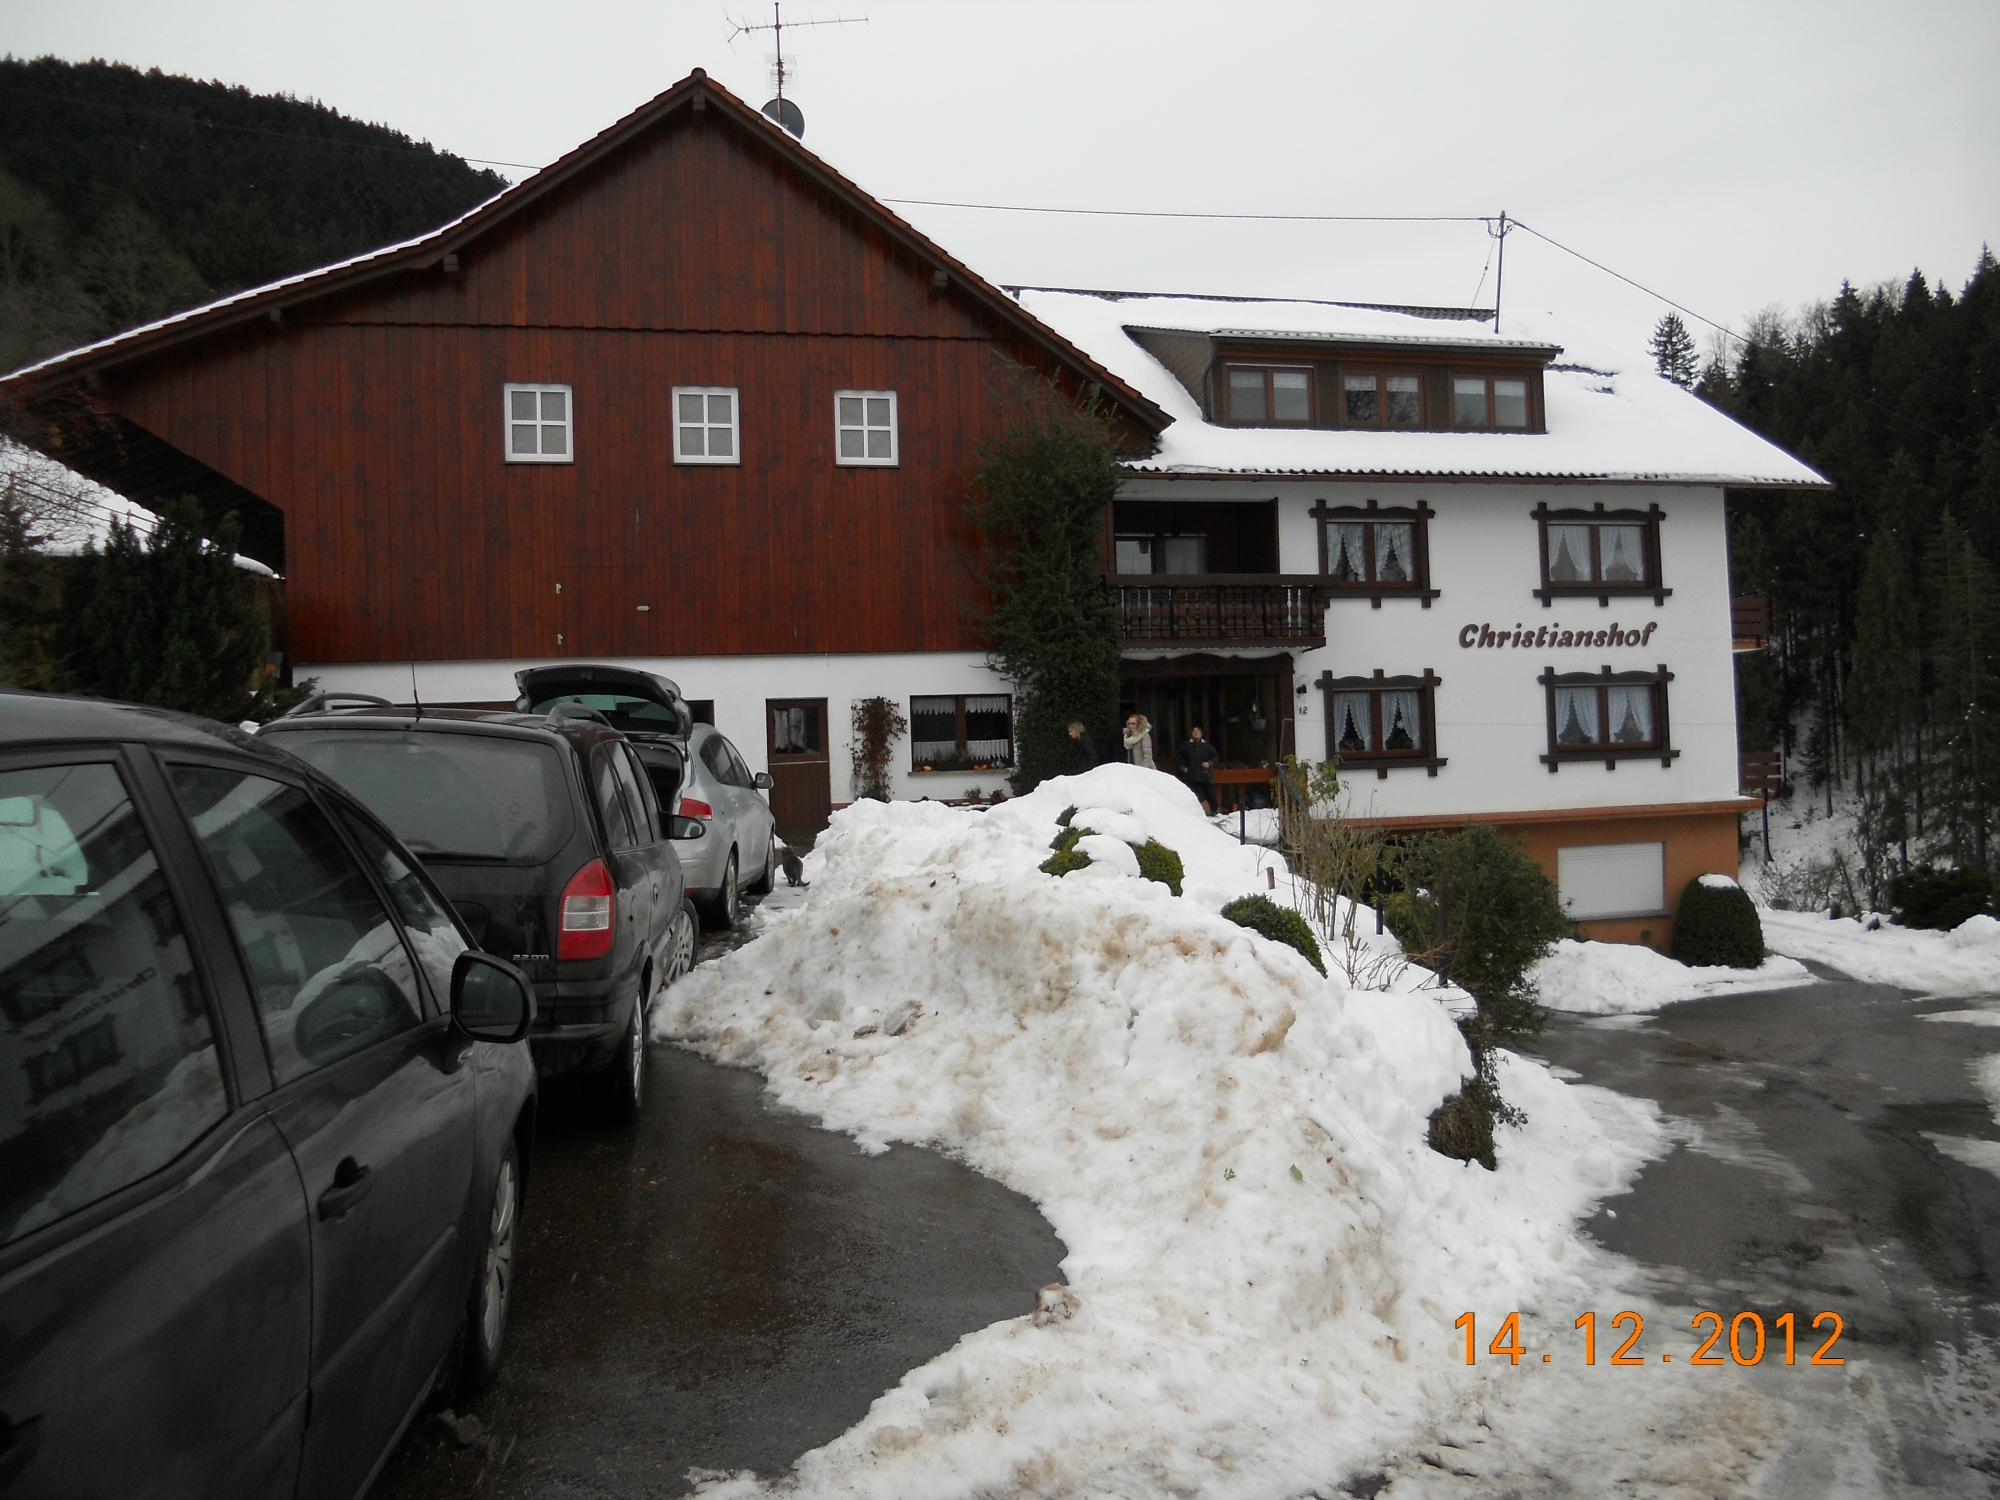 Christianshof